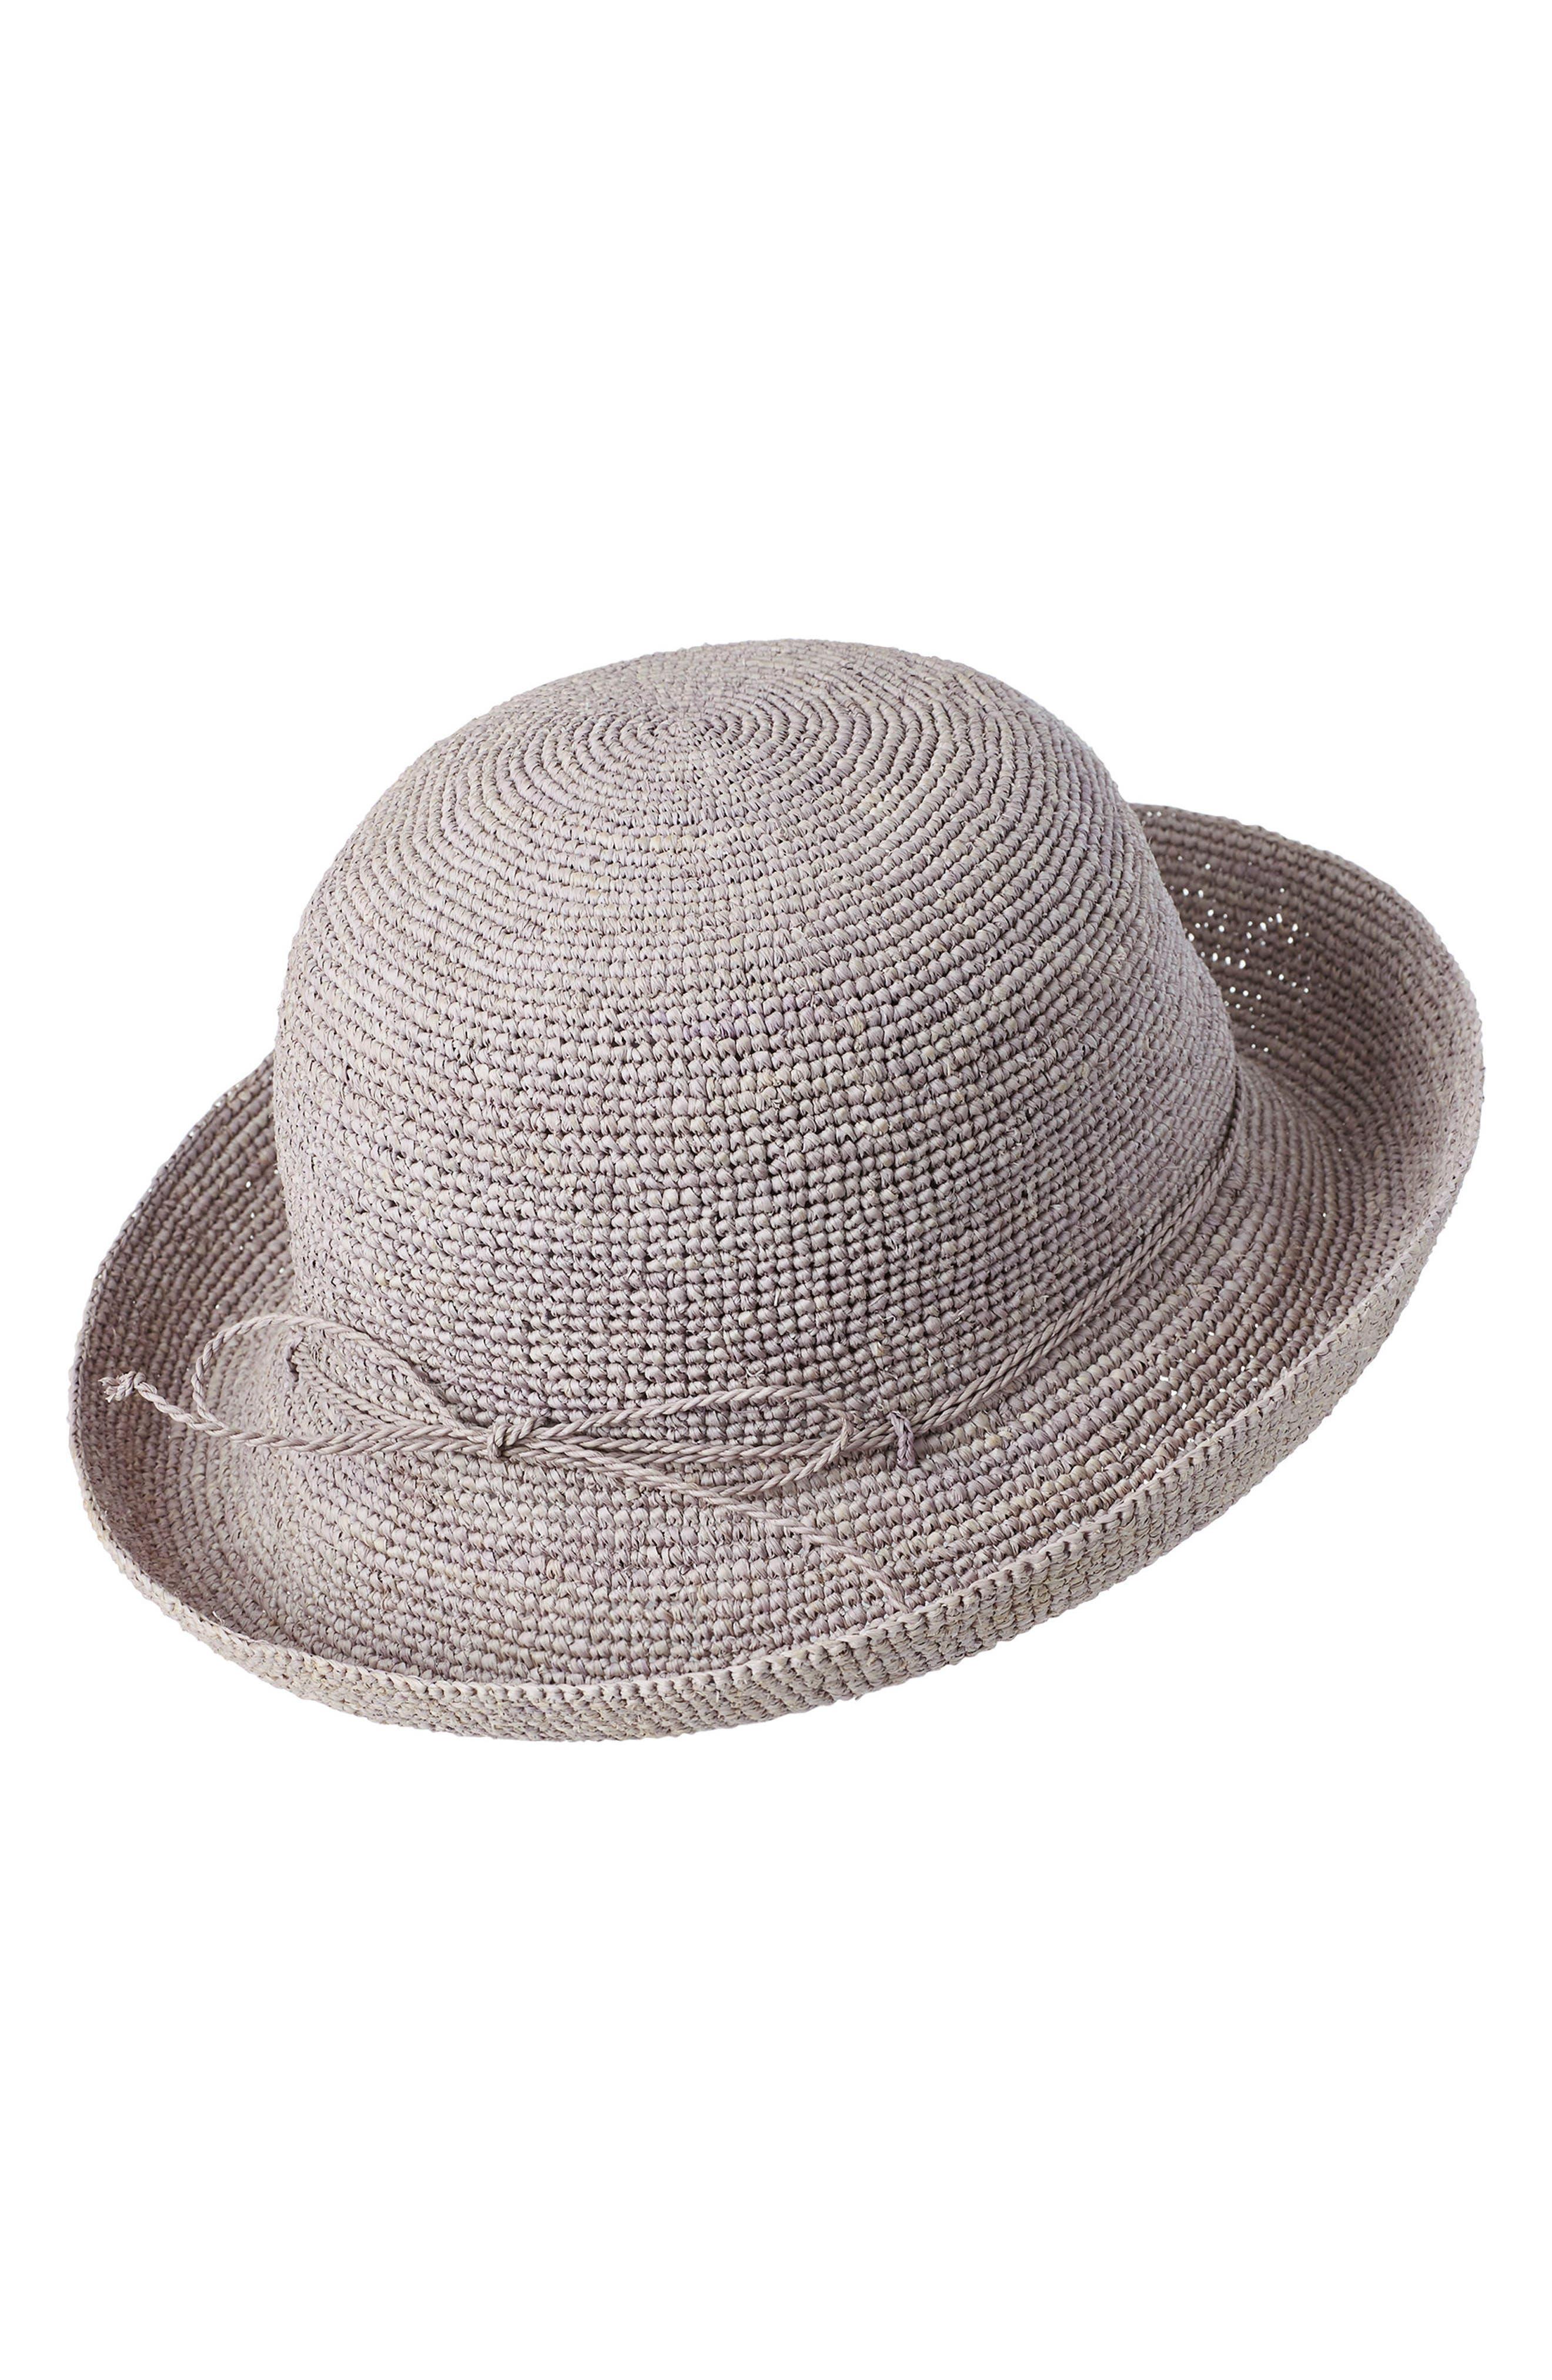 Main Image - Helen Kaminski Classic Upturn Crocheted Raffia Hat